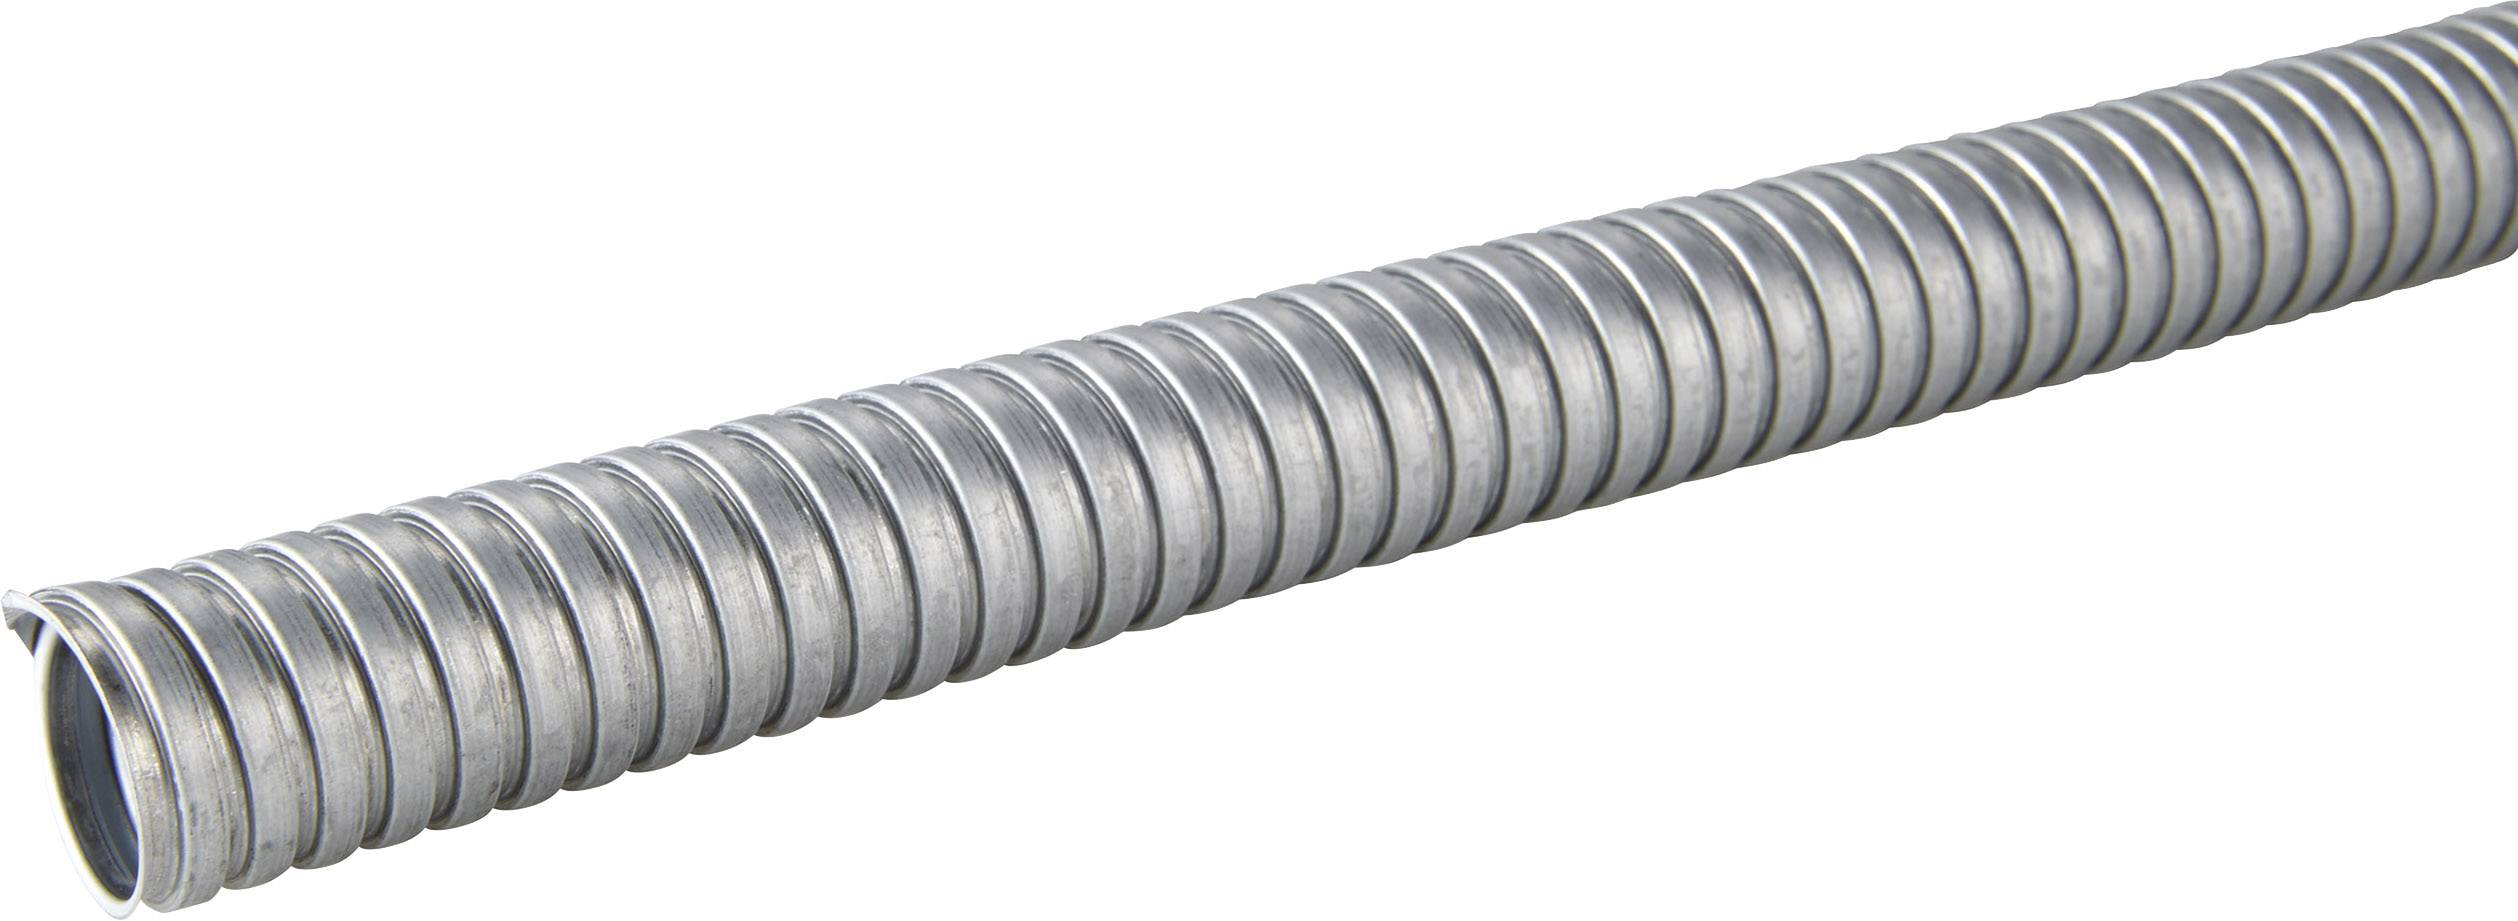 Ochranná hadice na kov LAPP SILVYN® AS 9/11x14 61802090, stříbrná, 50 m